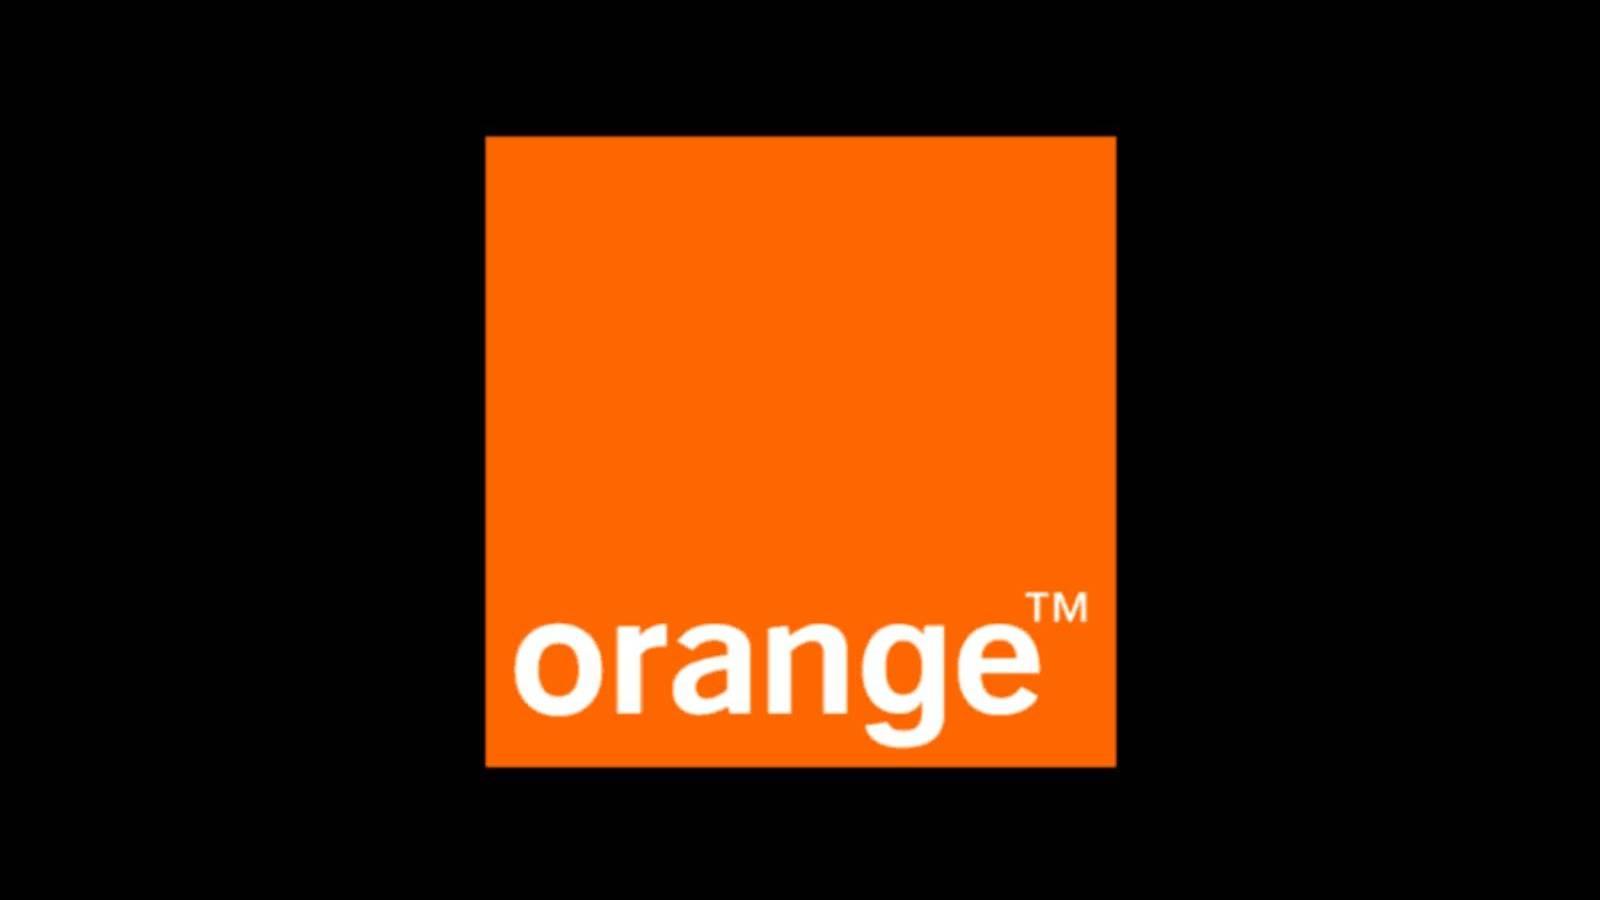 Orange Free Galaxy S21